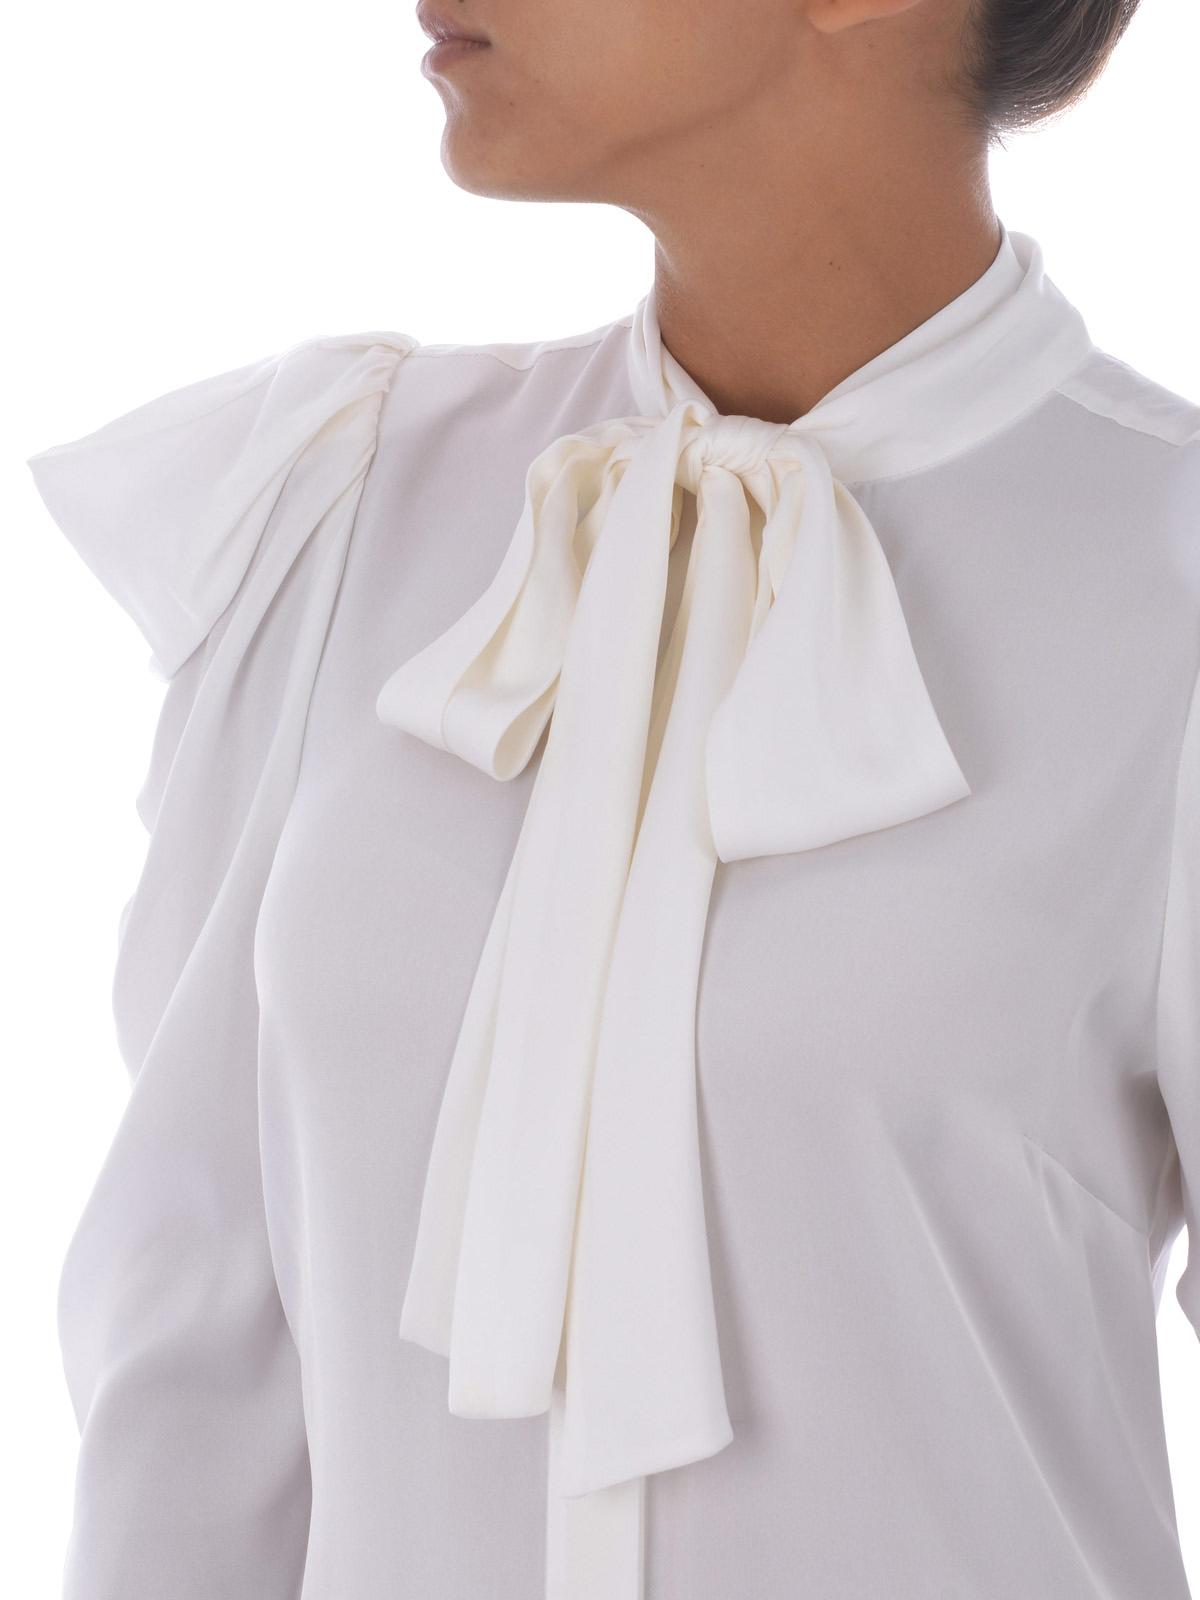 cfdeac7a114488 Michael Kors - Camicia con fiocco in seta bianca - camicie ...